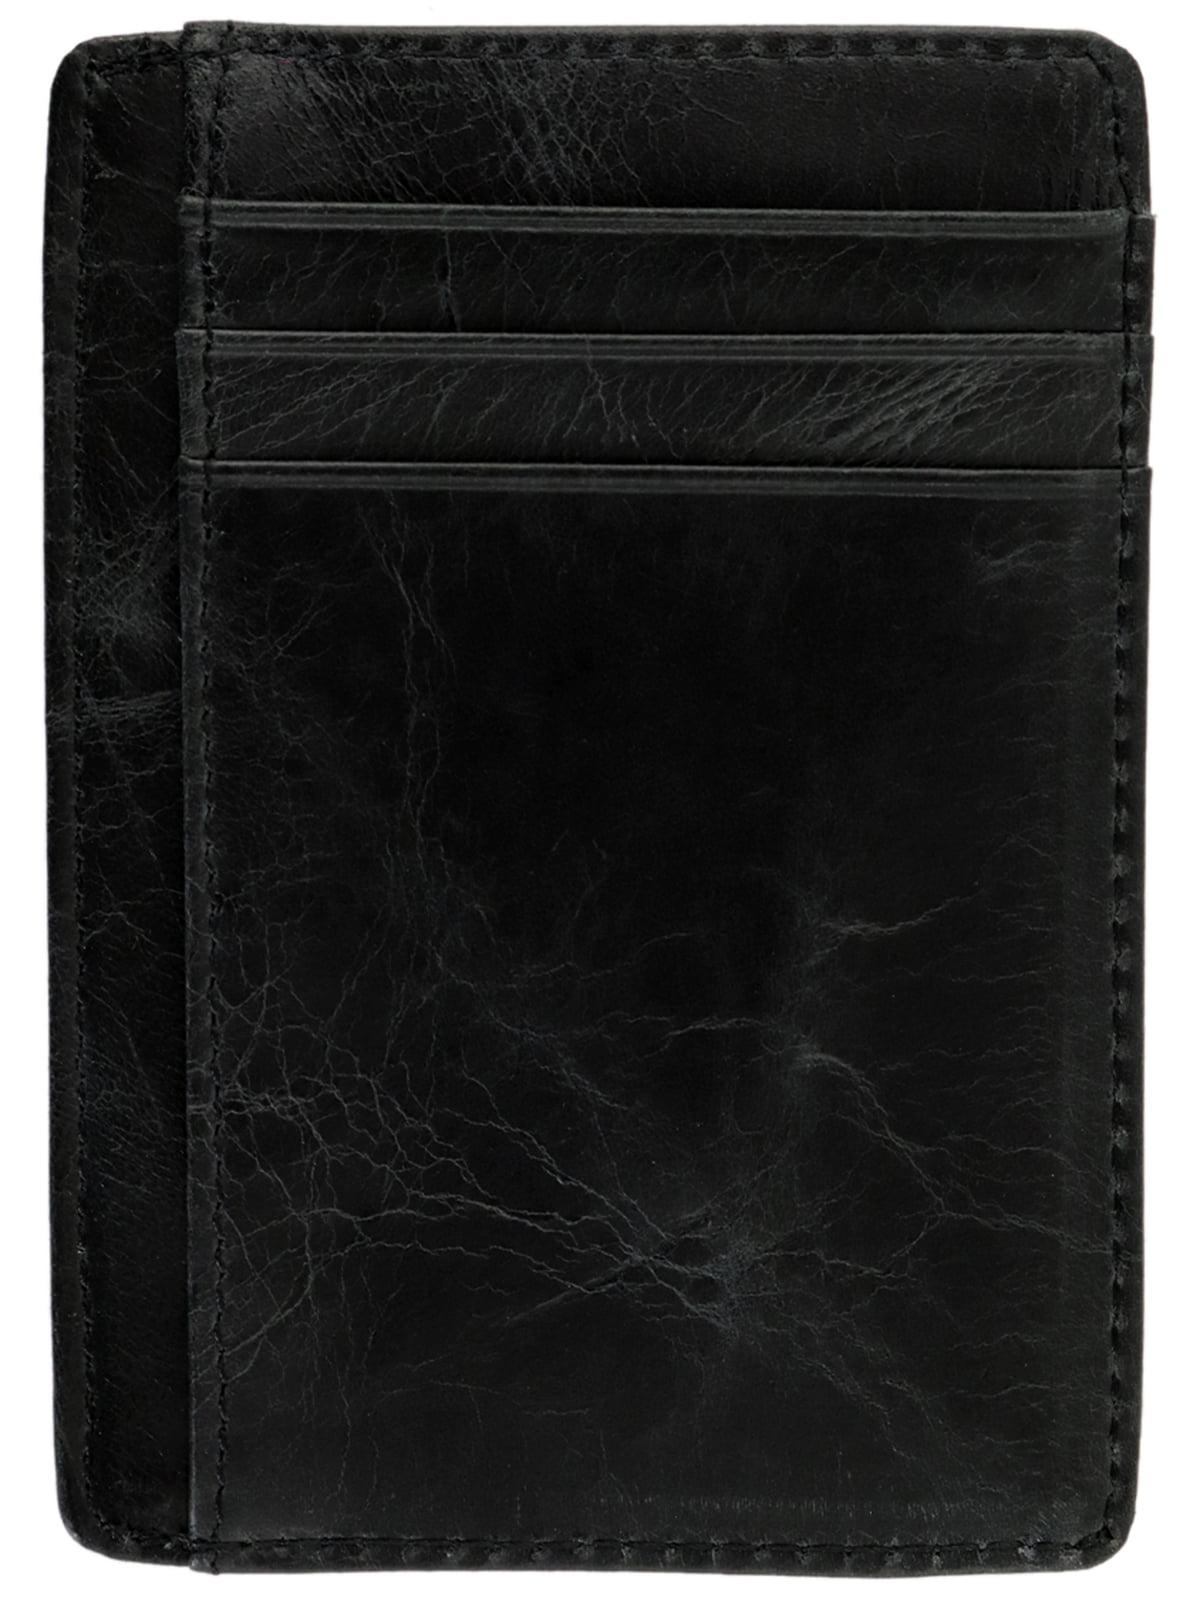 Картхолдер чорний | 4856217 | фото 2